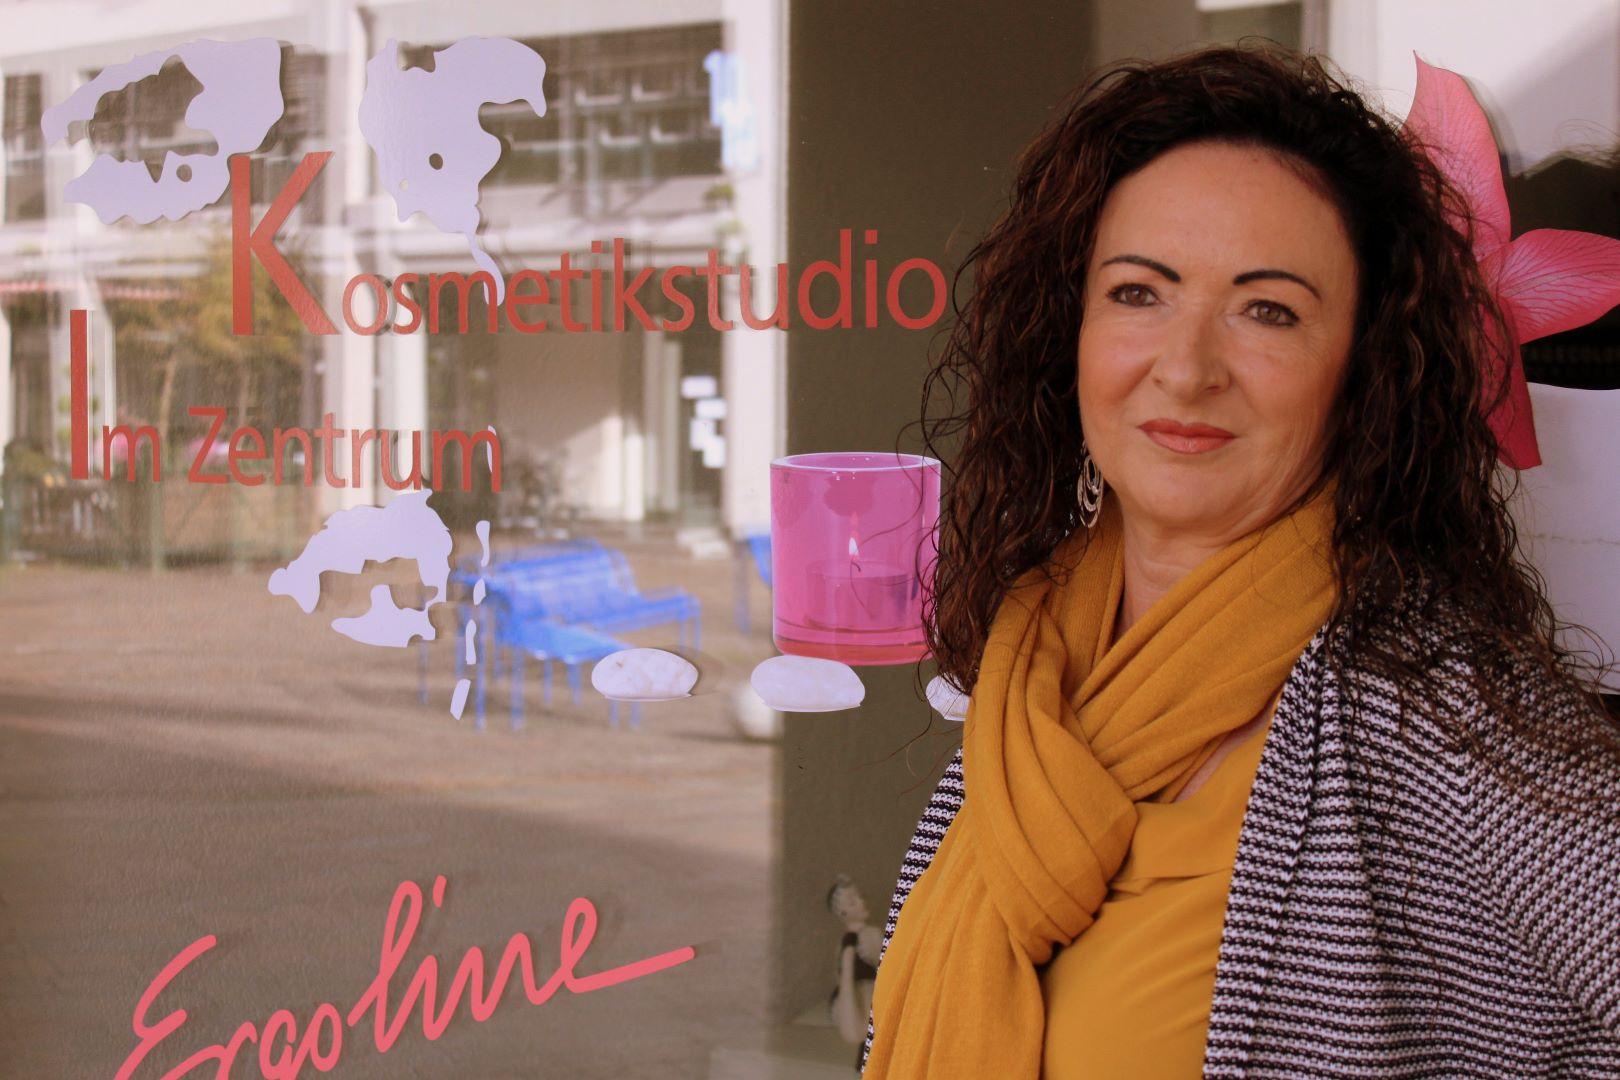 #Kosmetikstudio Im Zentrum #Katrin #Widmer ©SwissShots HJBlum